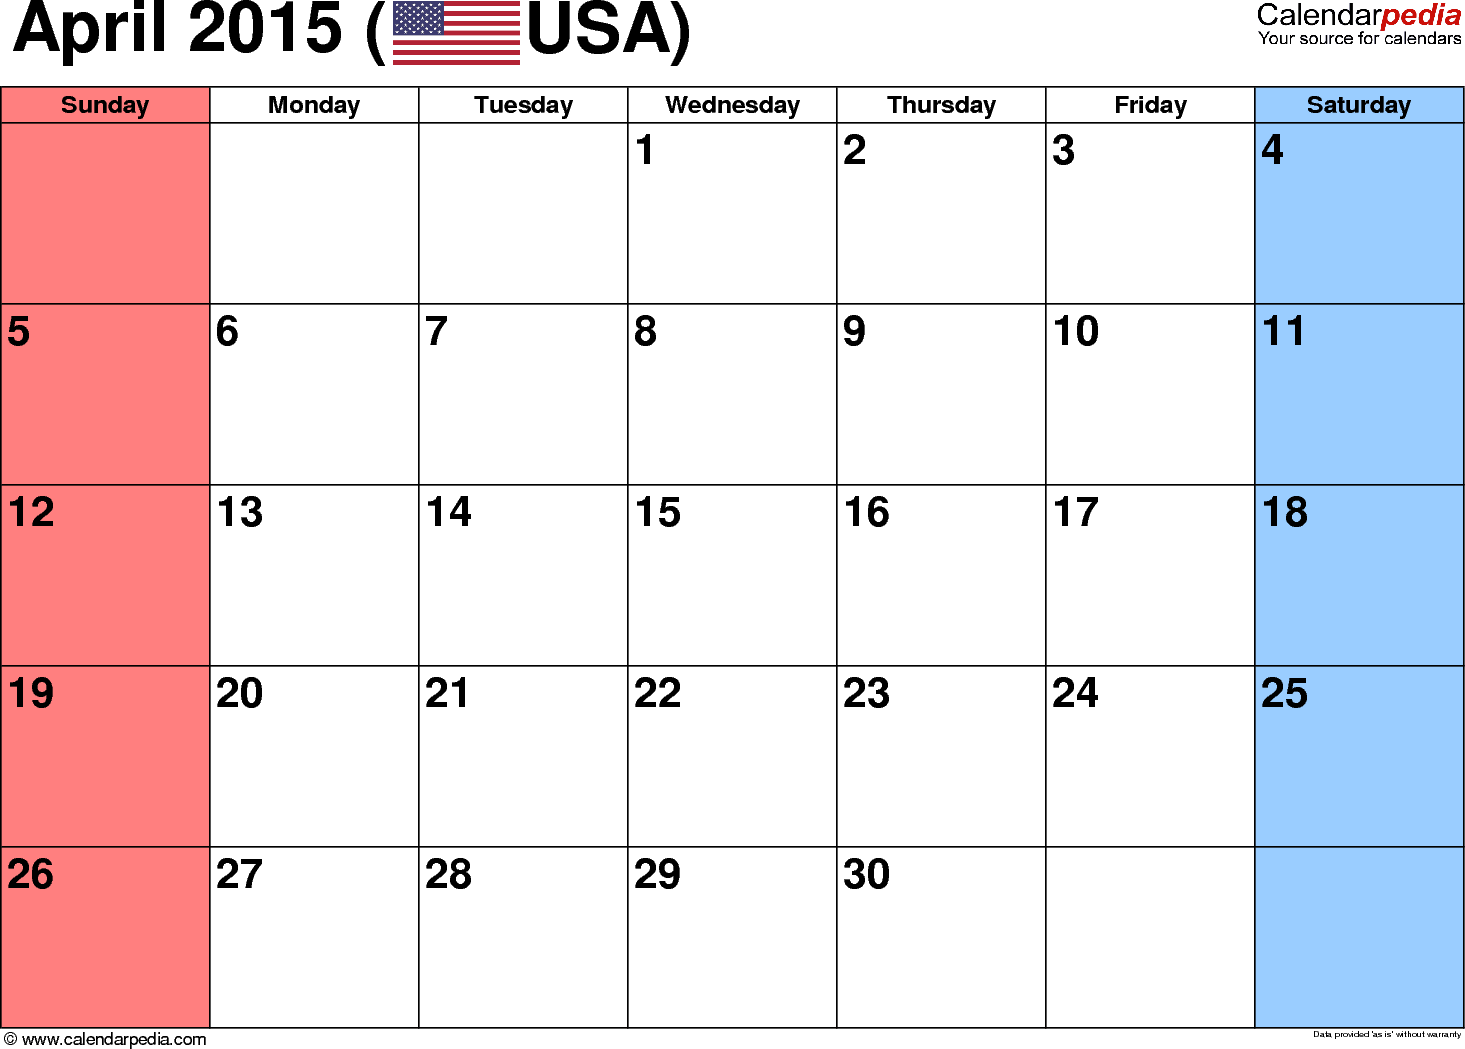 Blank April 2015 calendar